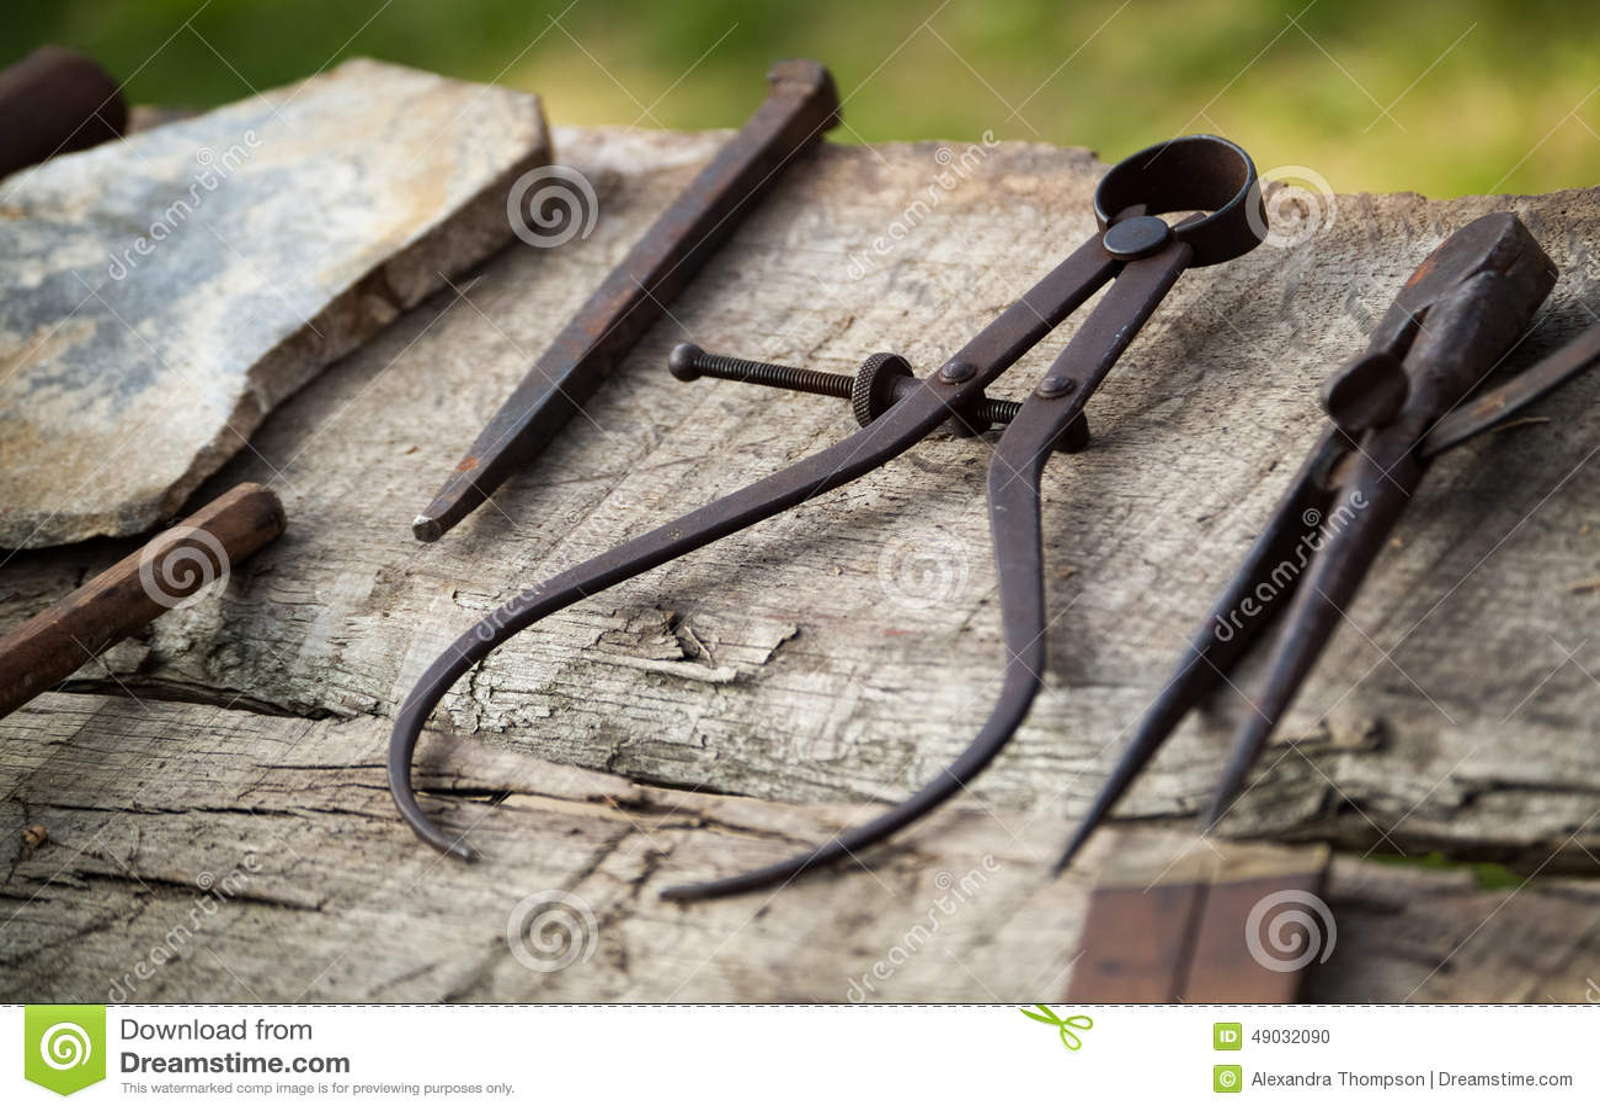 Carpentry Tools Stock Photo Image 49032090